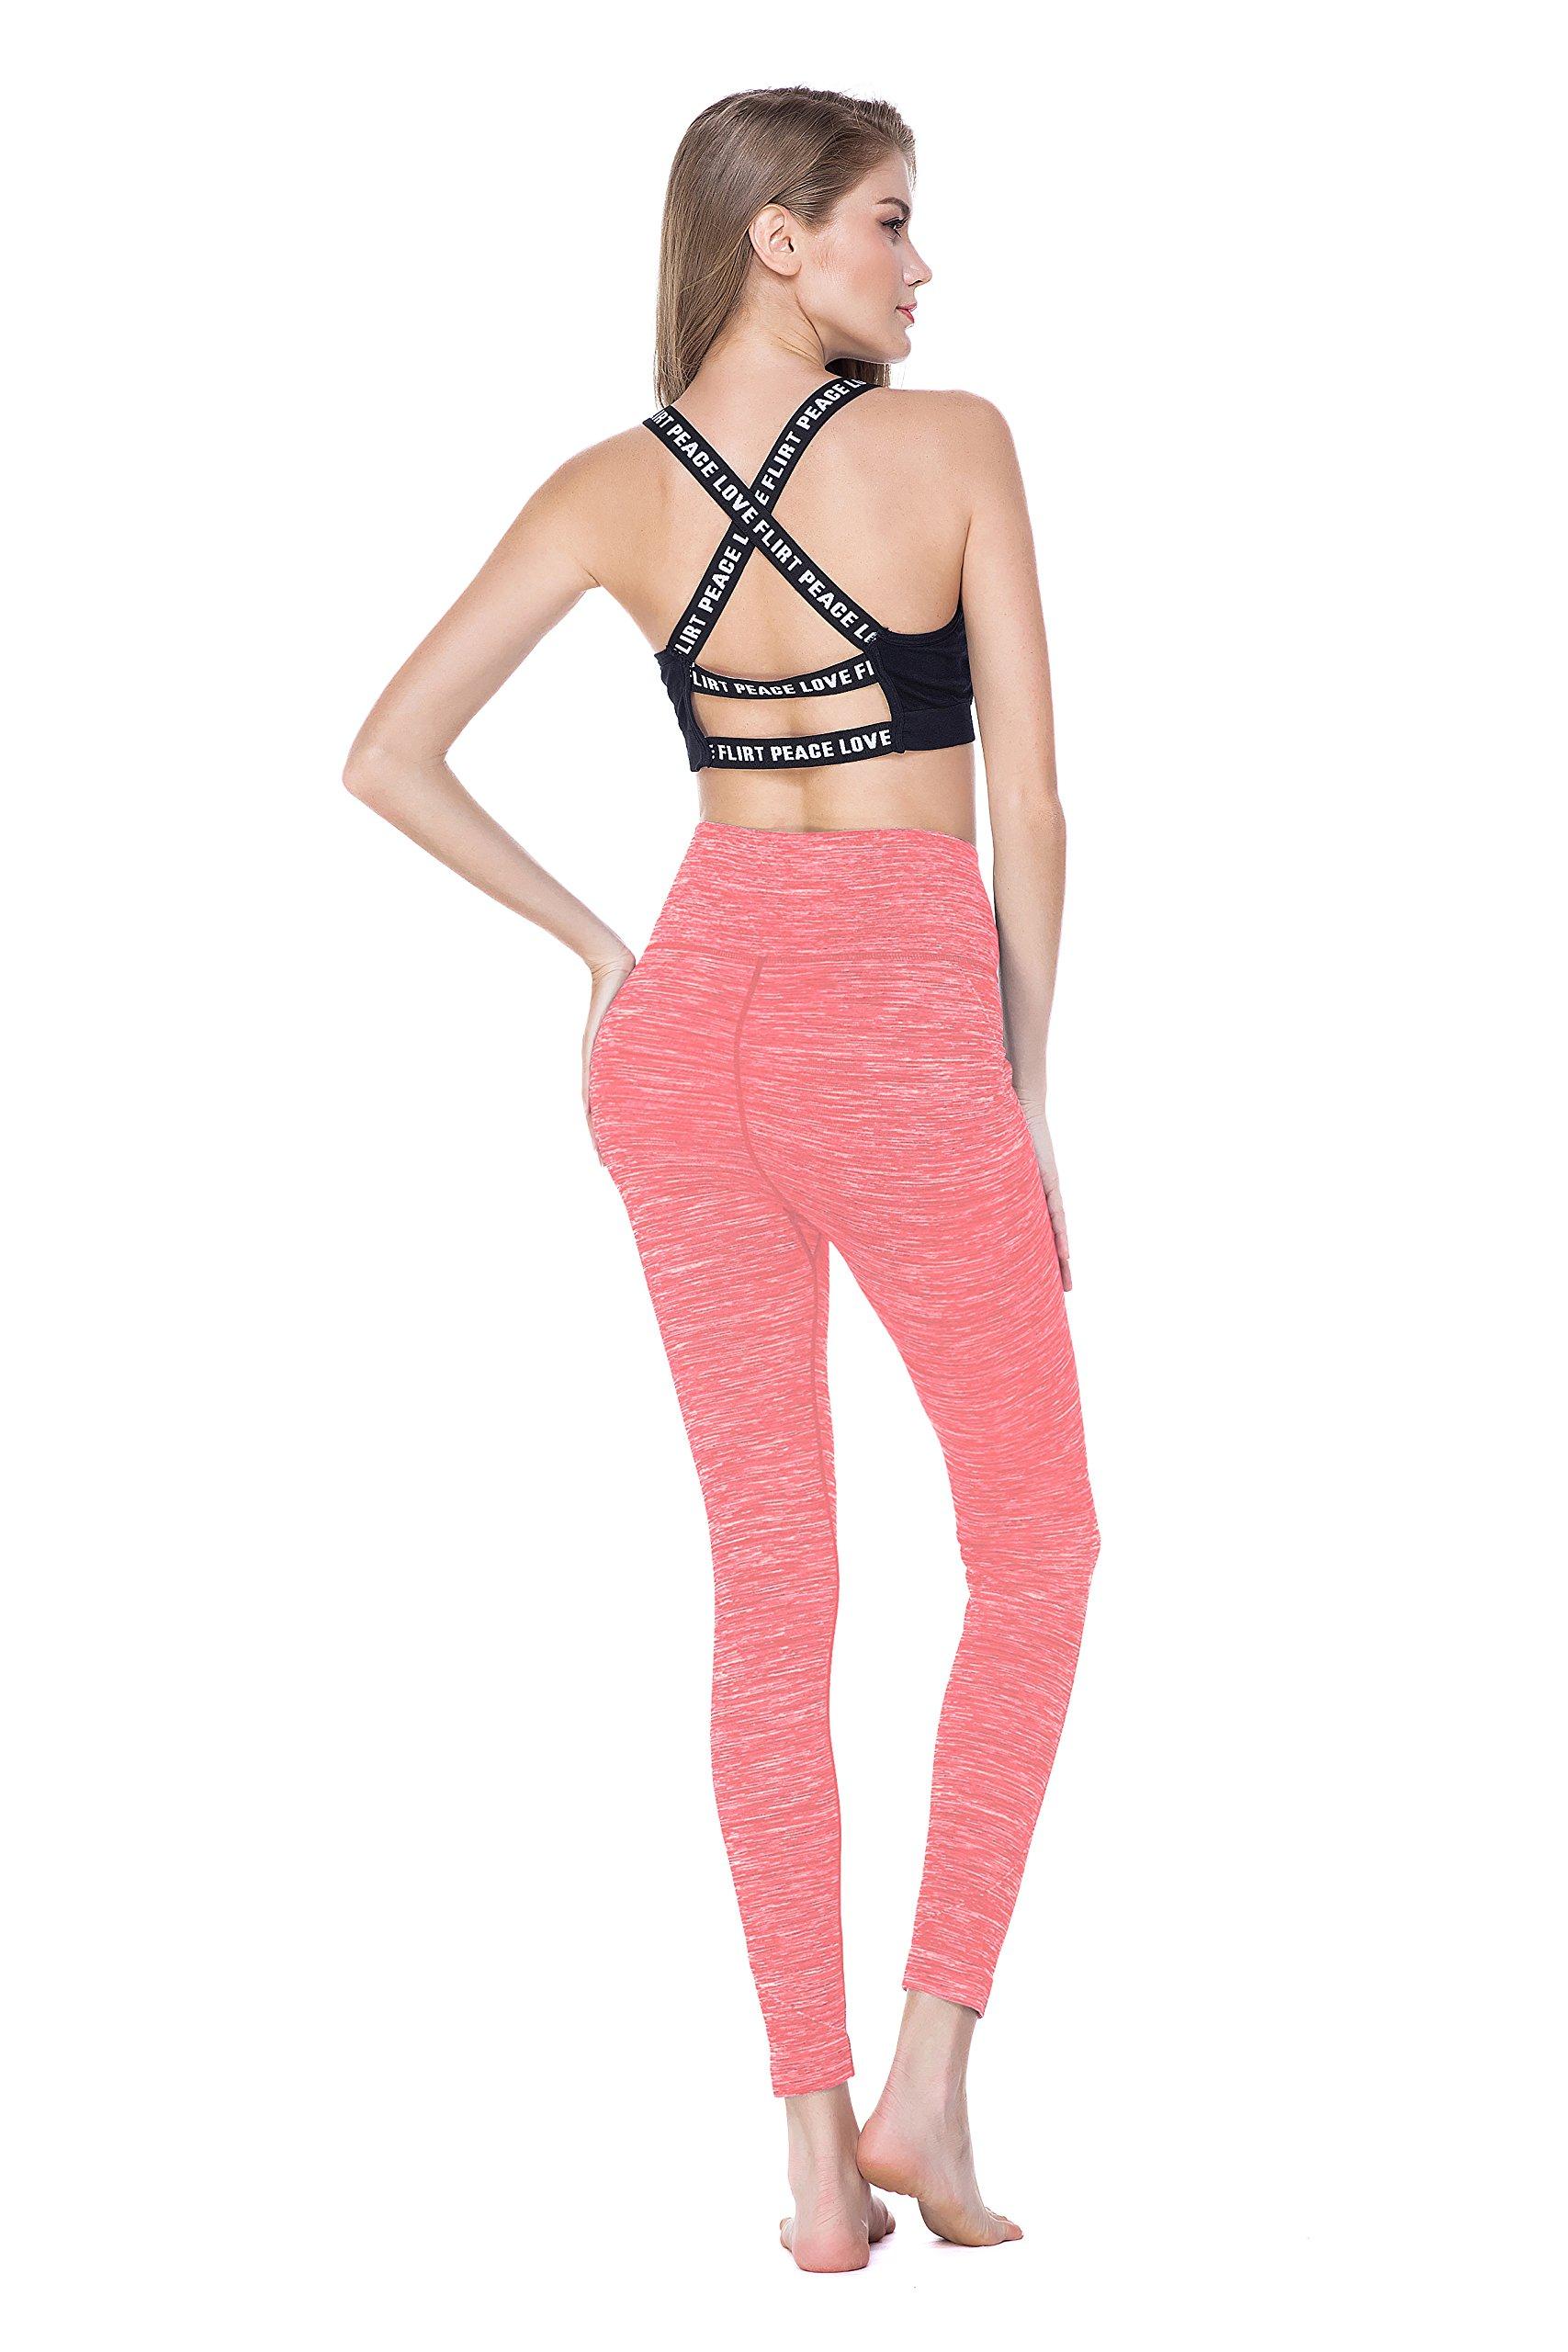 Women\'s Tummy Control Yoga Pants Leggings High Waist Running Tights 4 Way Stretch, Pink, S/M